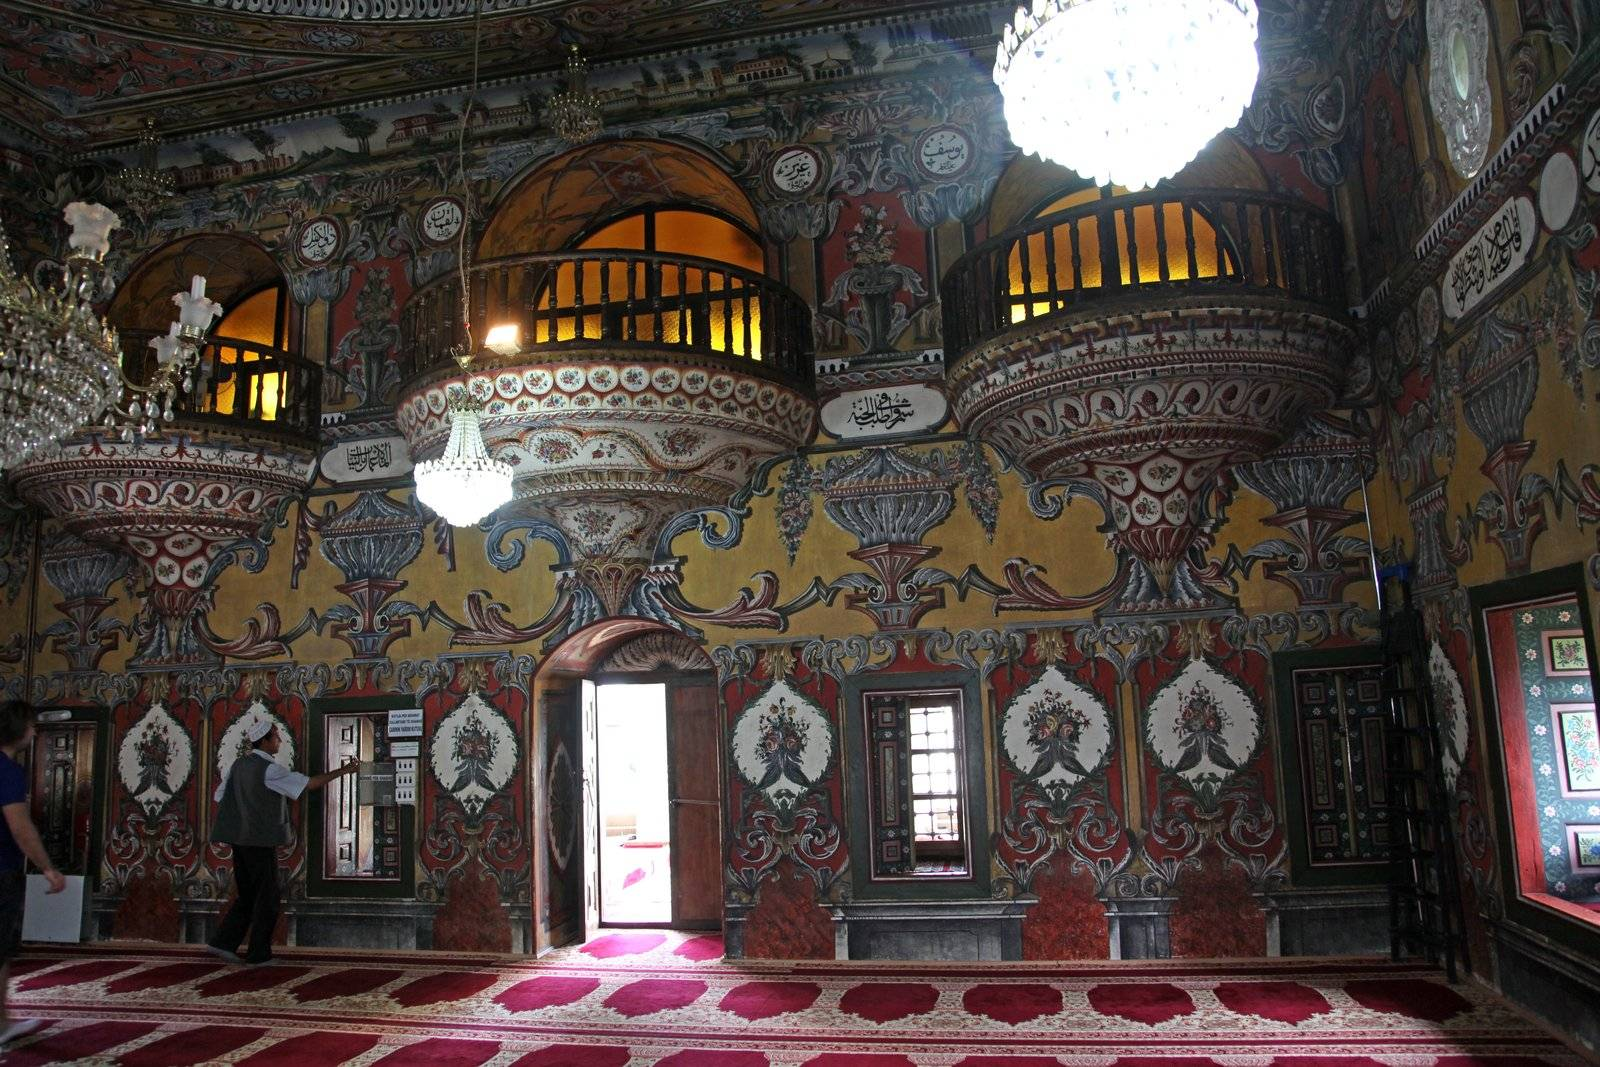 aladza, allah, arabic, balkans, baroque, city - D13123296